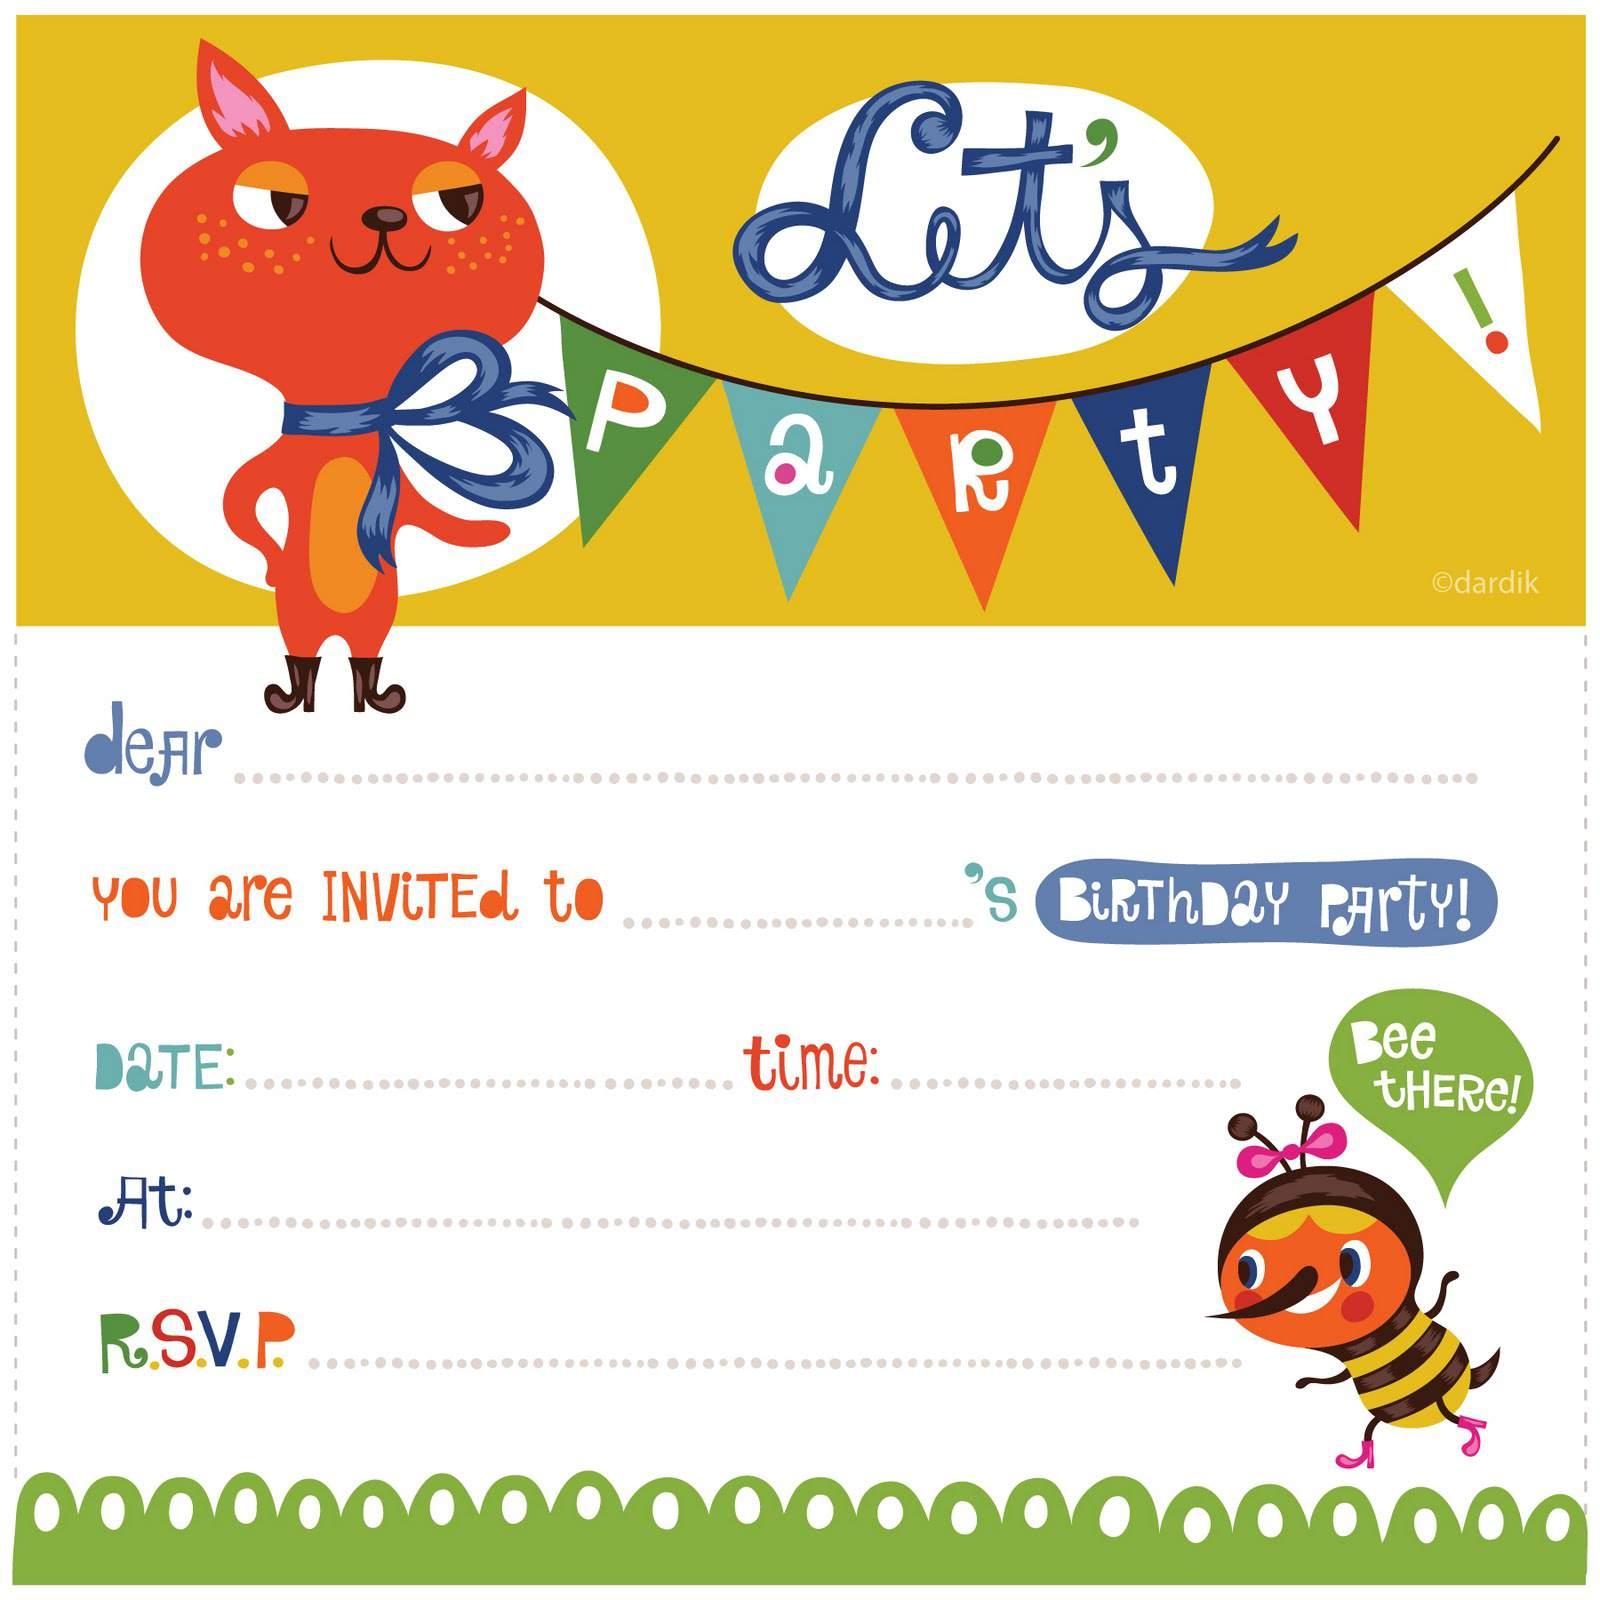 17 Free, Printable Birthday Invitations - Free Printable Toddler Birthday Invitations